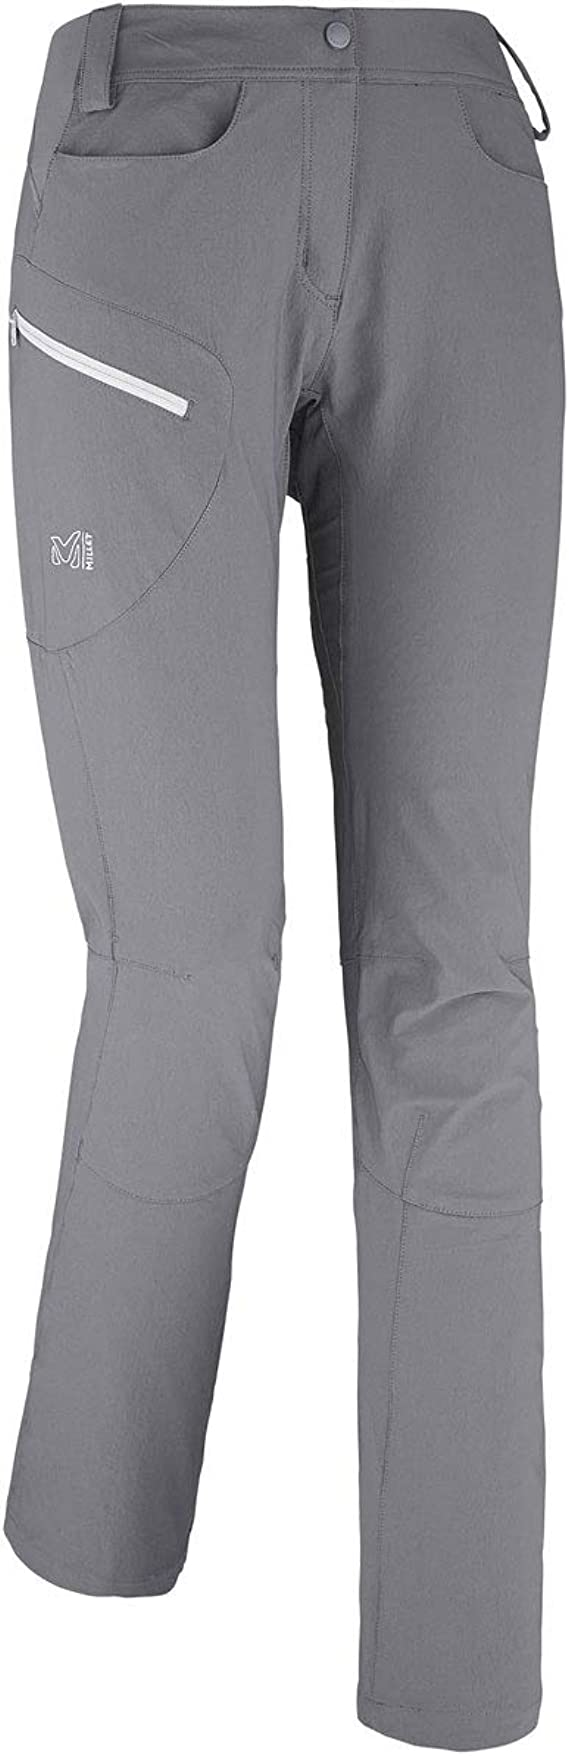 Millet LD Trekker Stretch Pant – Pantalón para Mujer, Mujer, Color